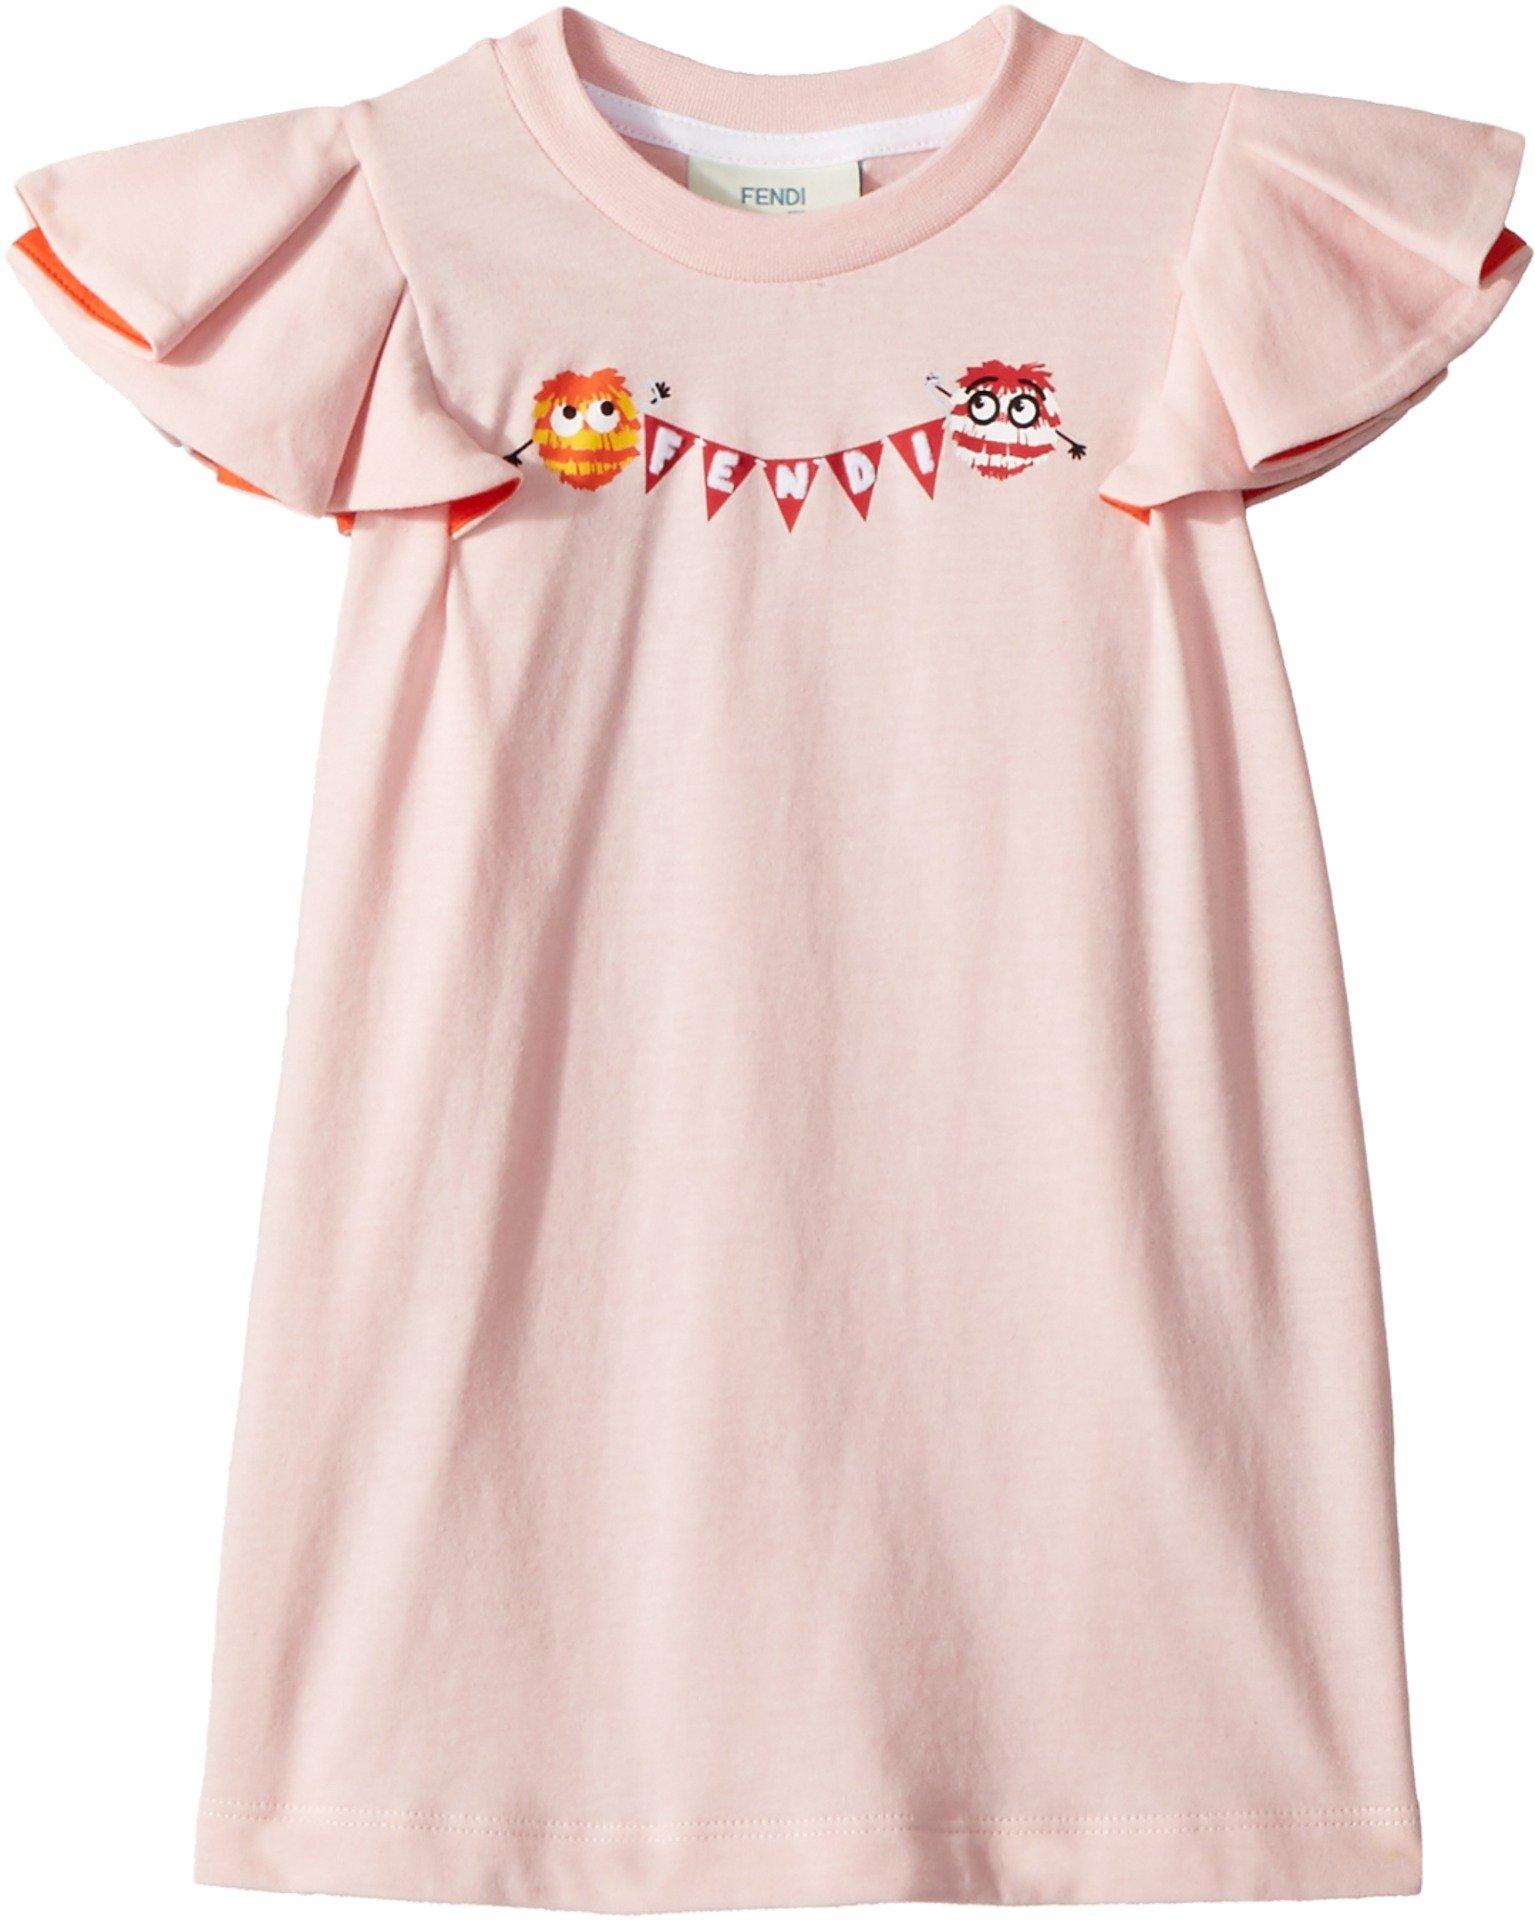 Fendi Kids Baby Girl's Ruffle Sleeve Logo Pom Pom Graphic T-Shirt (Toddler) Pink 3 Years